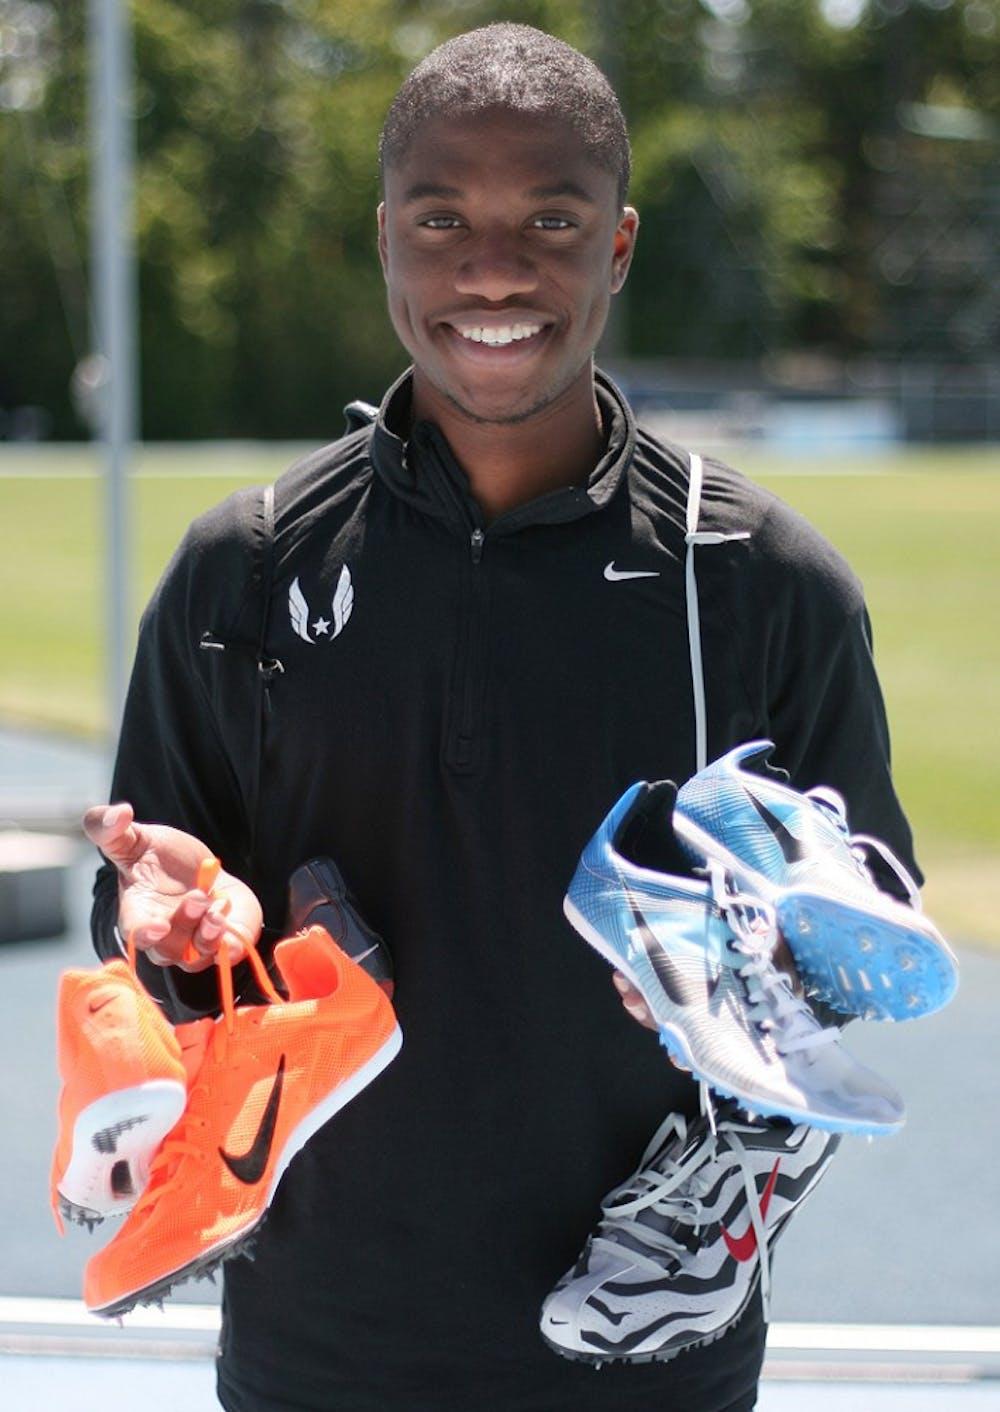 Freshman mid-distance runner O'Neal Wanliss starts non-profit, Spikes 4 Tykes